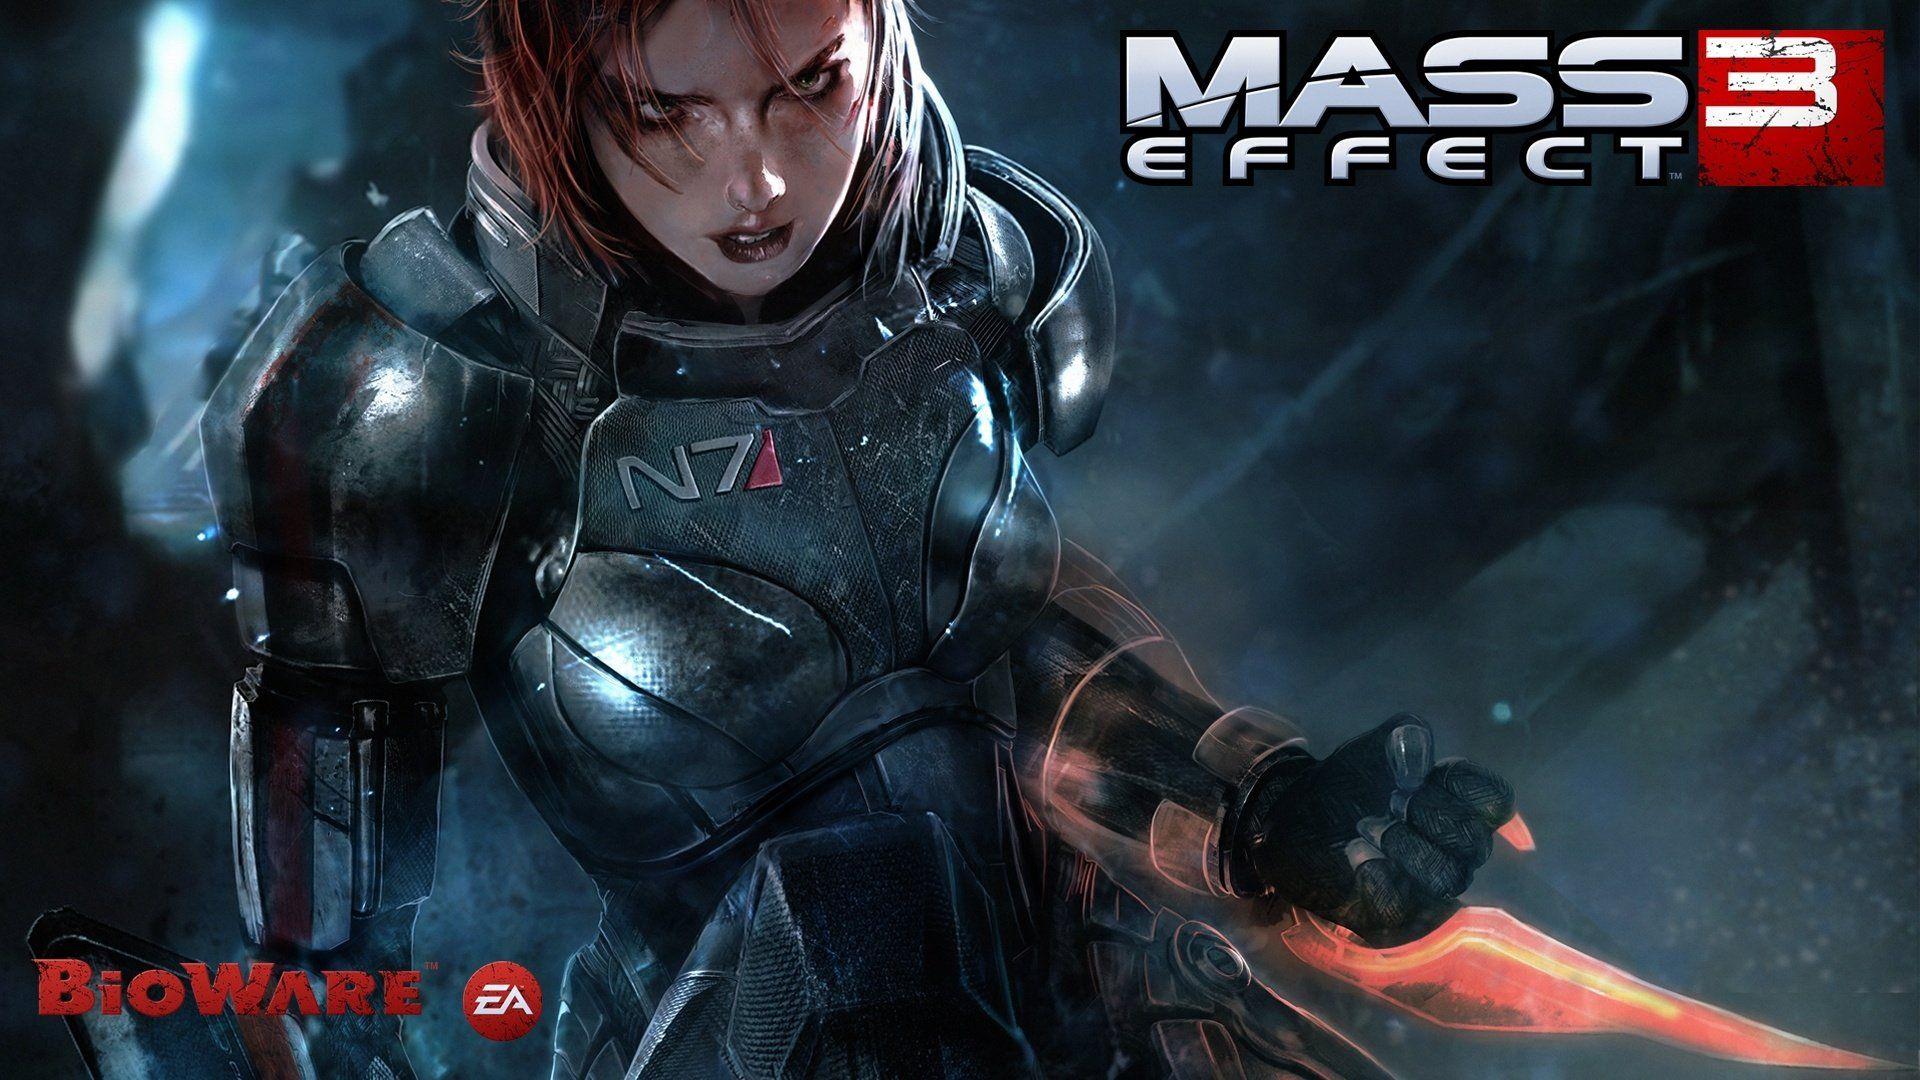 1920x1080 Mass Effect 3 Wallpaper Background Image. View